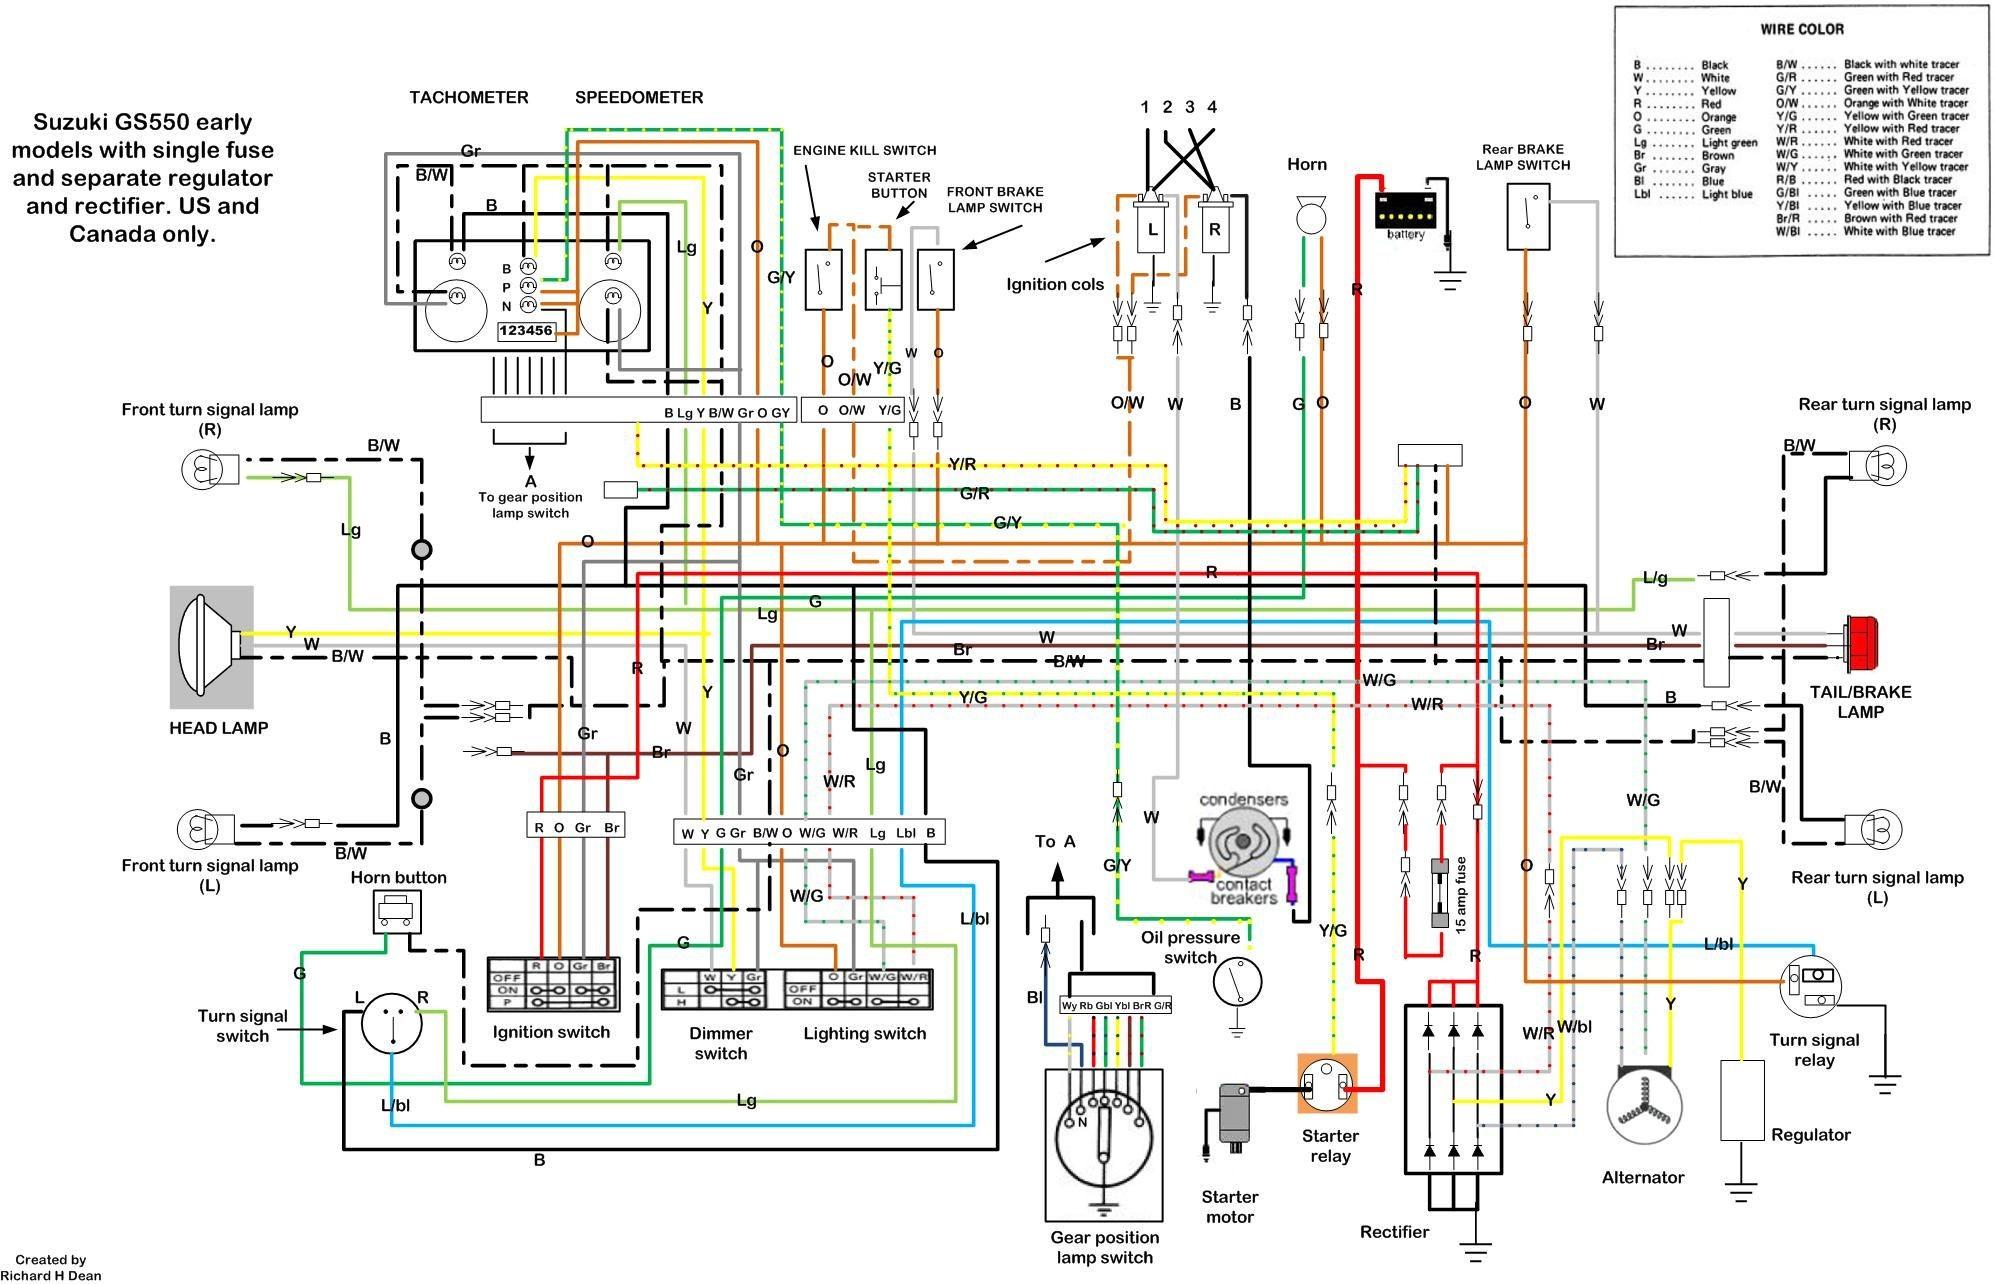 Suzuki Motorcycle Wiring Diagram as Well Wiring Diagram for 1980 Suzuki 550 Becker Wiring Diagram Of Suzuki Motorcycle Wiring Diagram